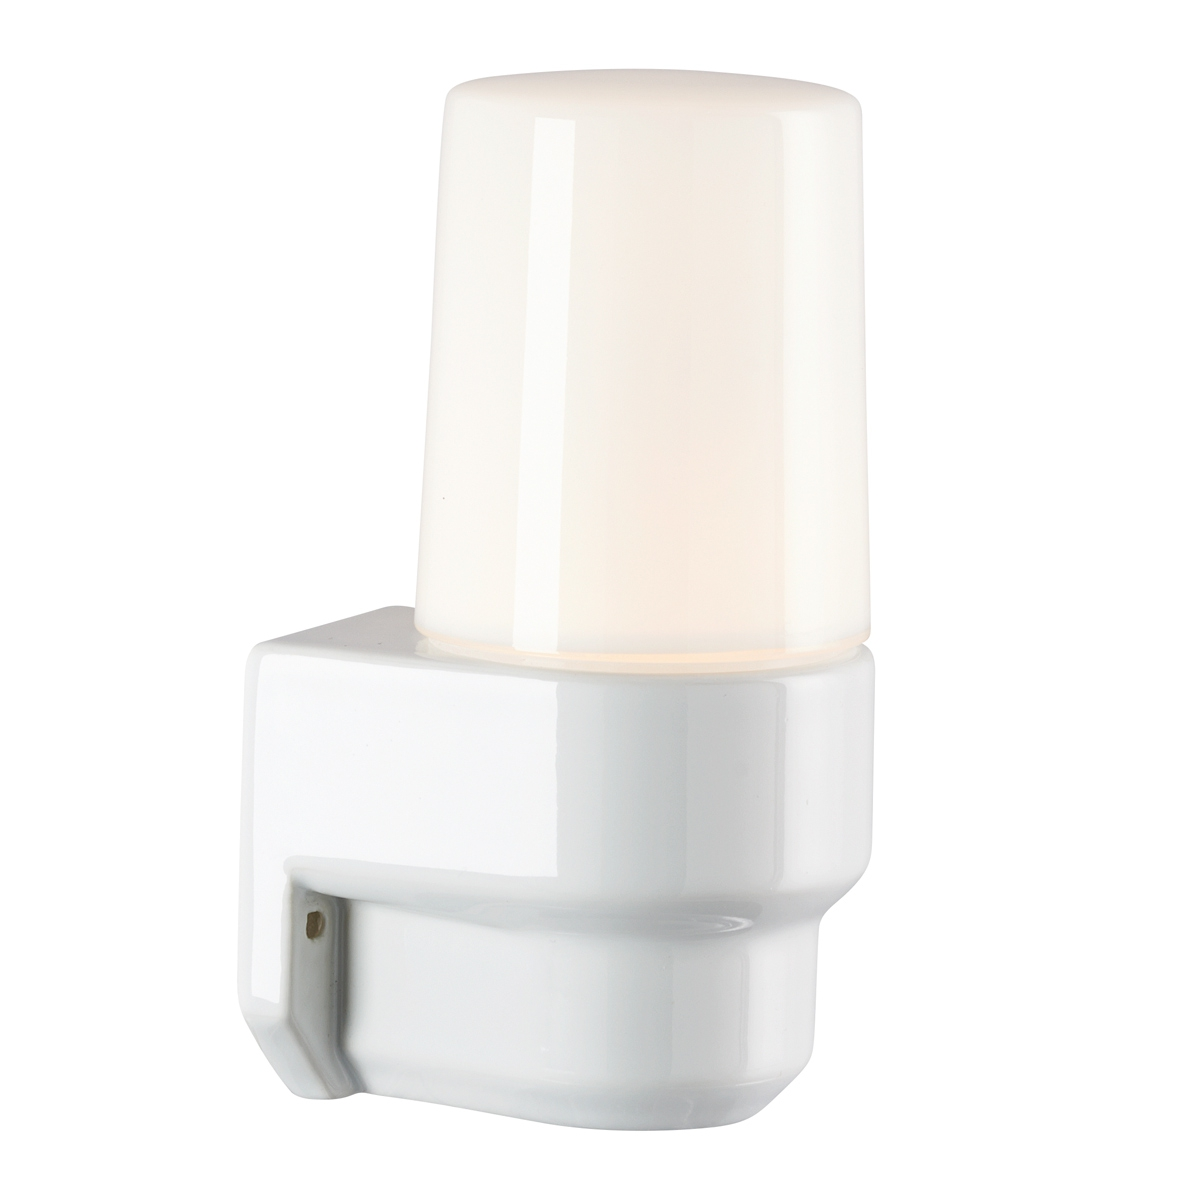 klassische wandleuchte als sauna lampe oder f r spiegel. Black Bedroom Furniture Sets. Home Design Ideas